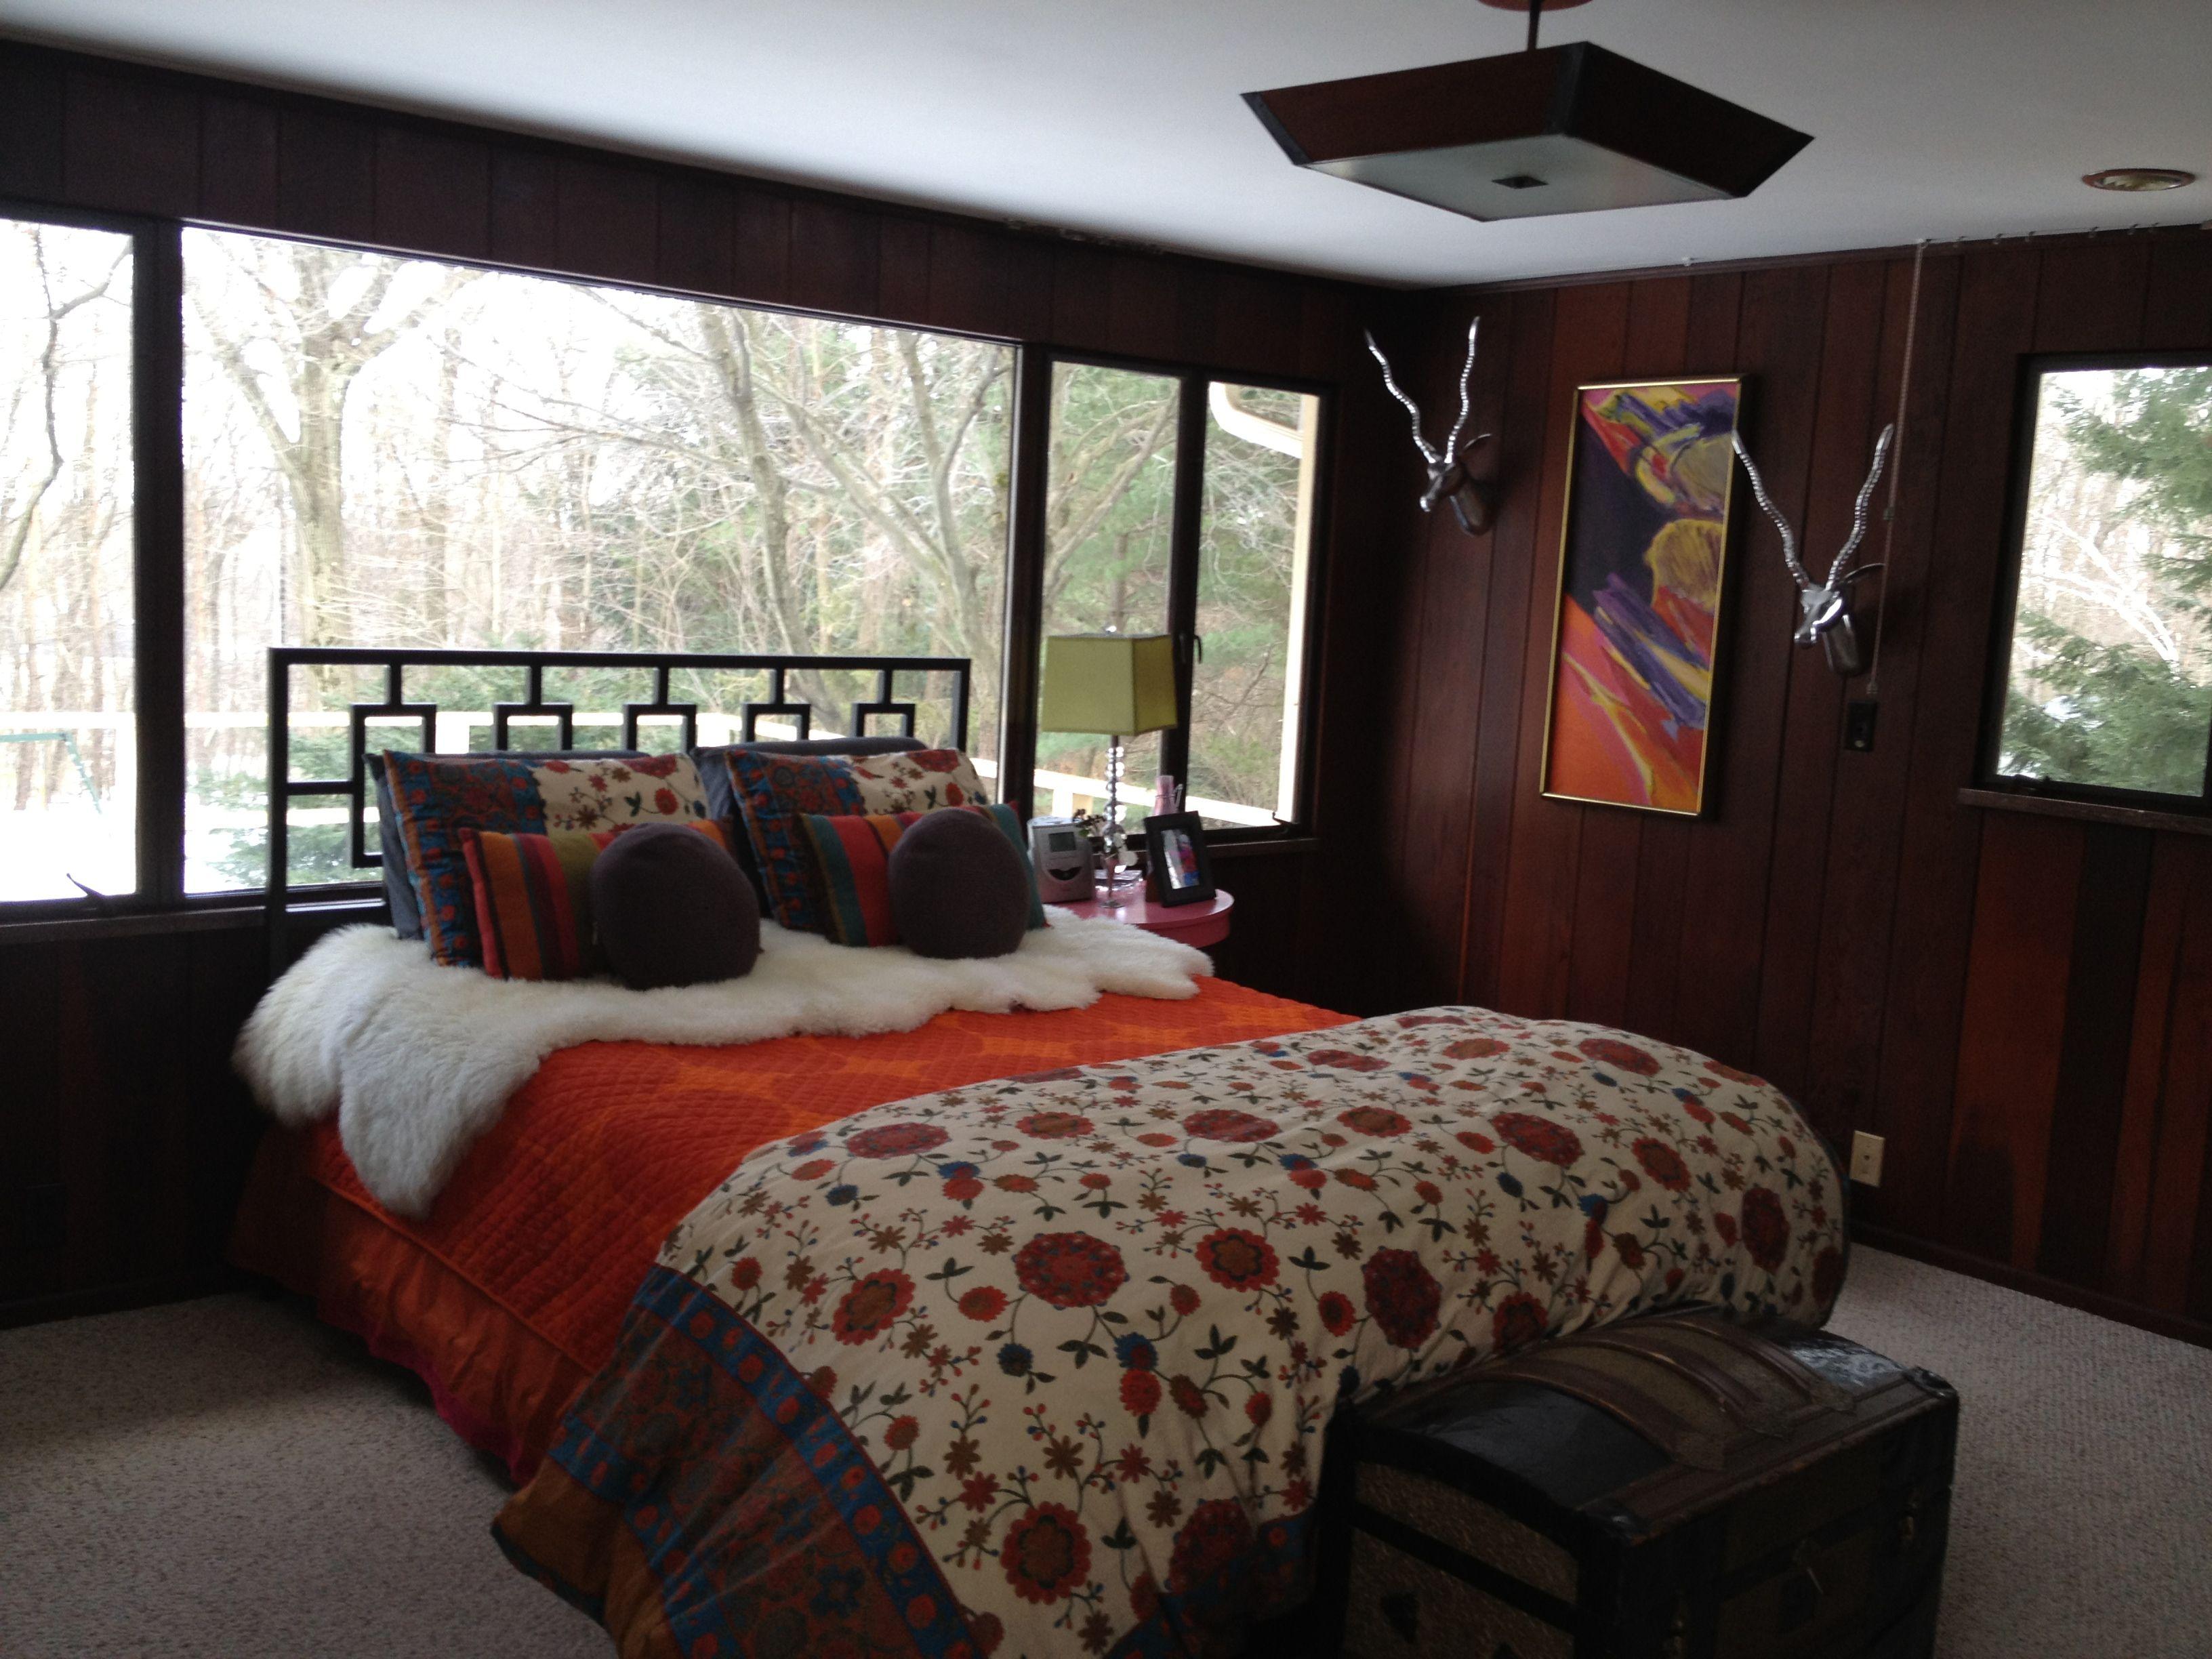 Master bedroom images  Colorful modern master bedroom  Decoration ideas  Pinterest